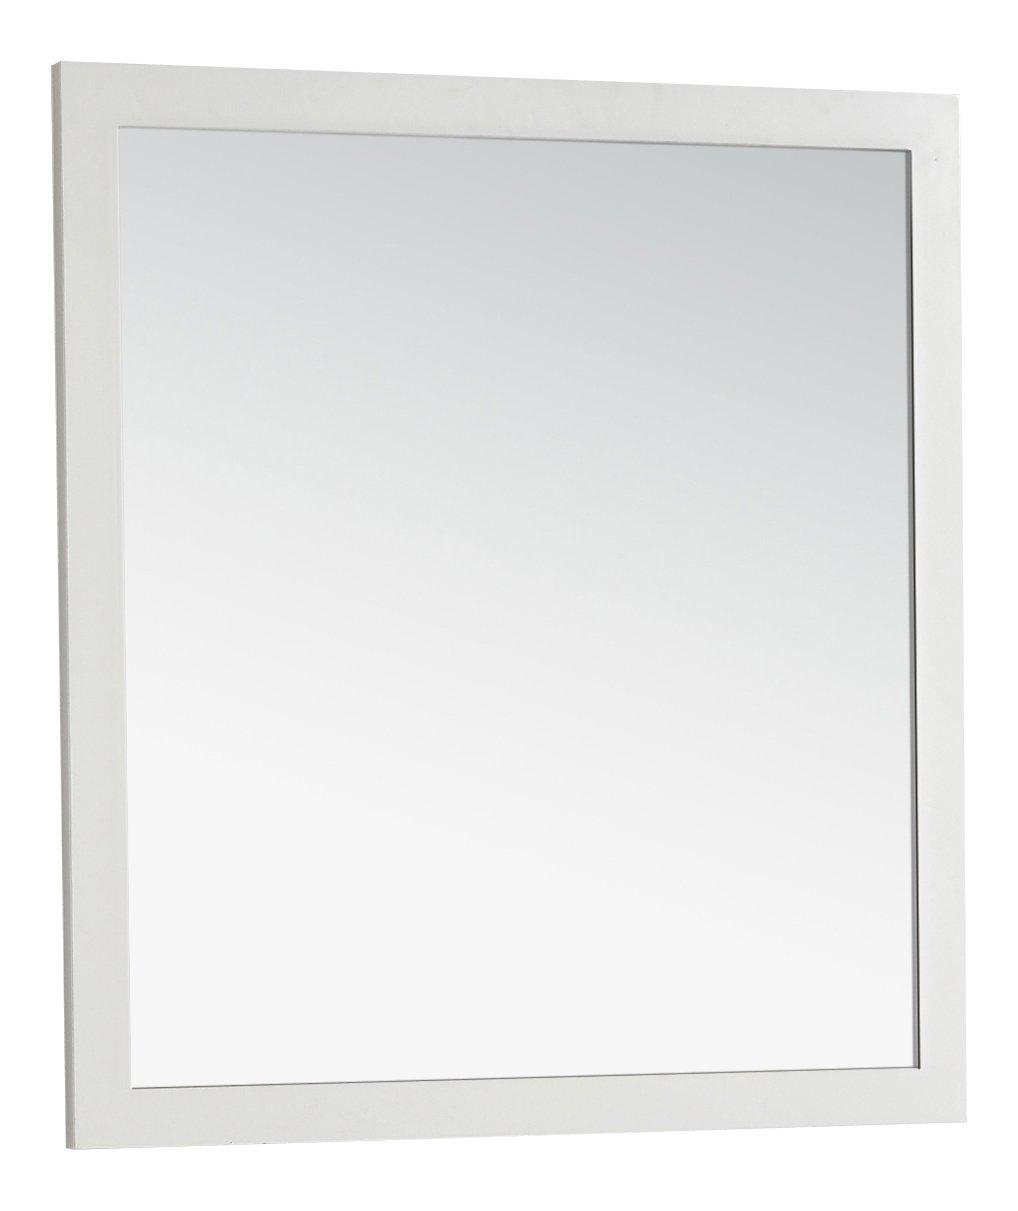 Simpli Home Chelsea Bath Vanity Mirror, 32 by 34-Inch, Soft White